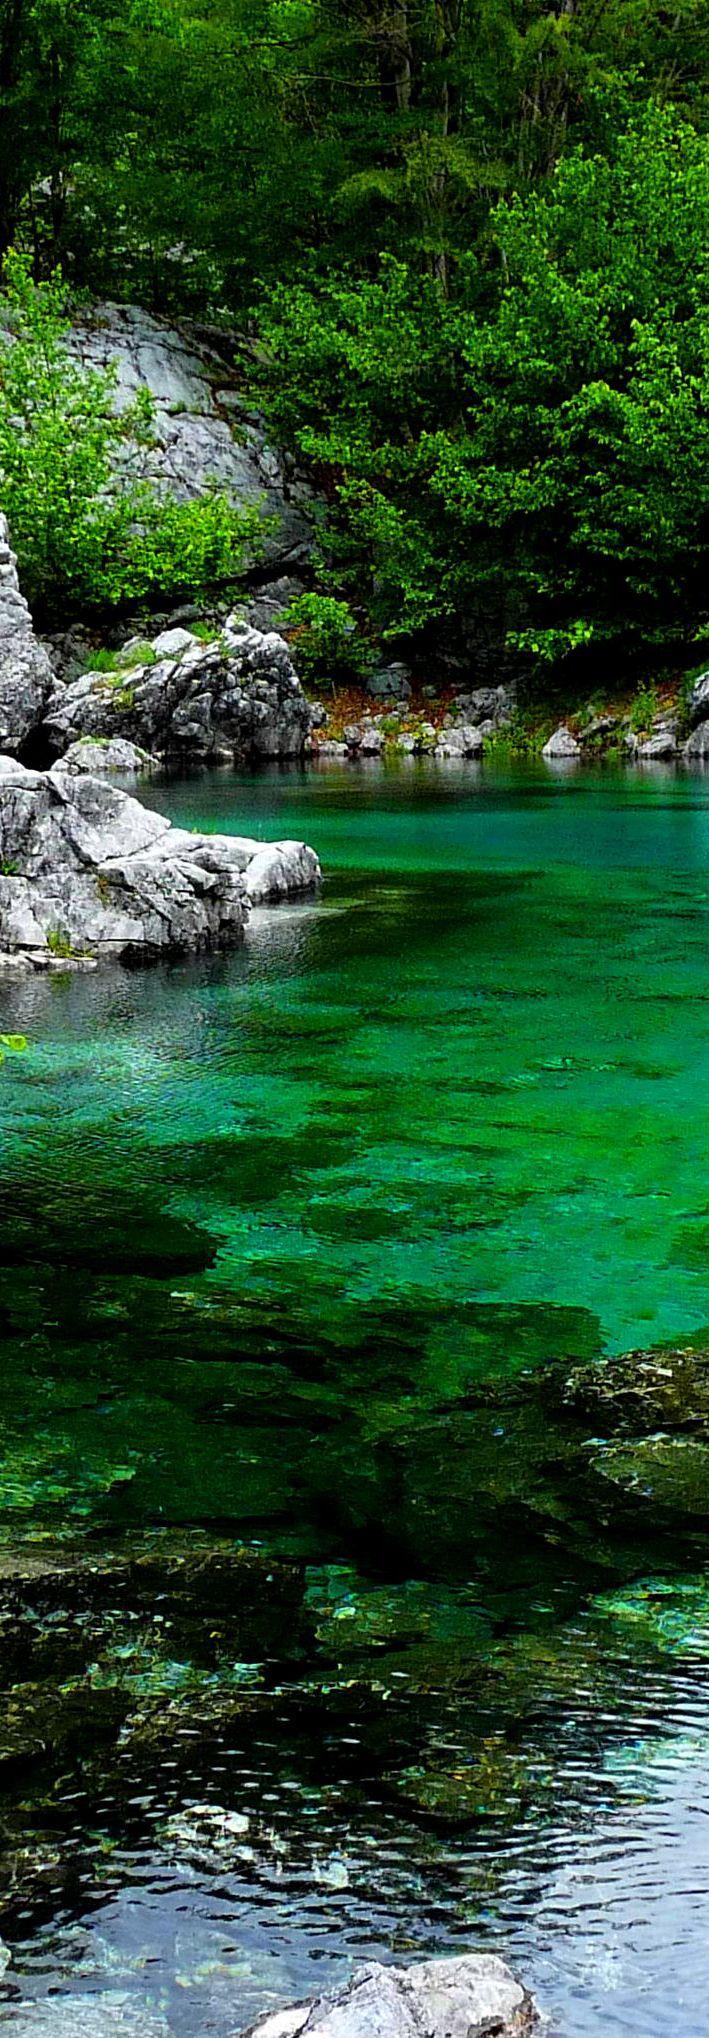 Valbona Valley. Valbona, Albania. Valbona National Park, Northeastern Albanian Alps, will undergo in UNESCO's protection.